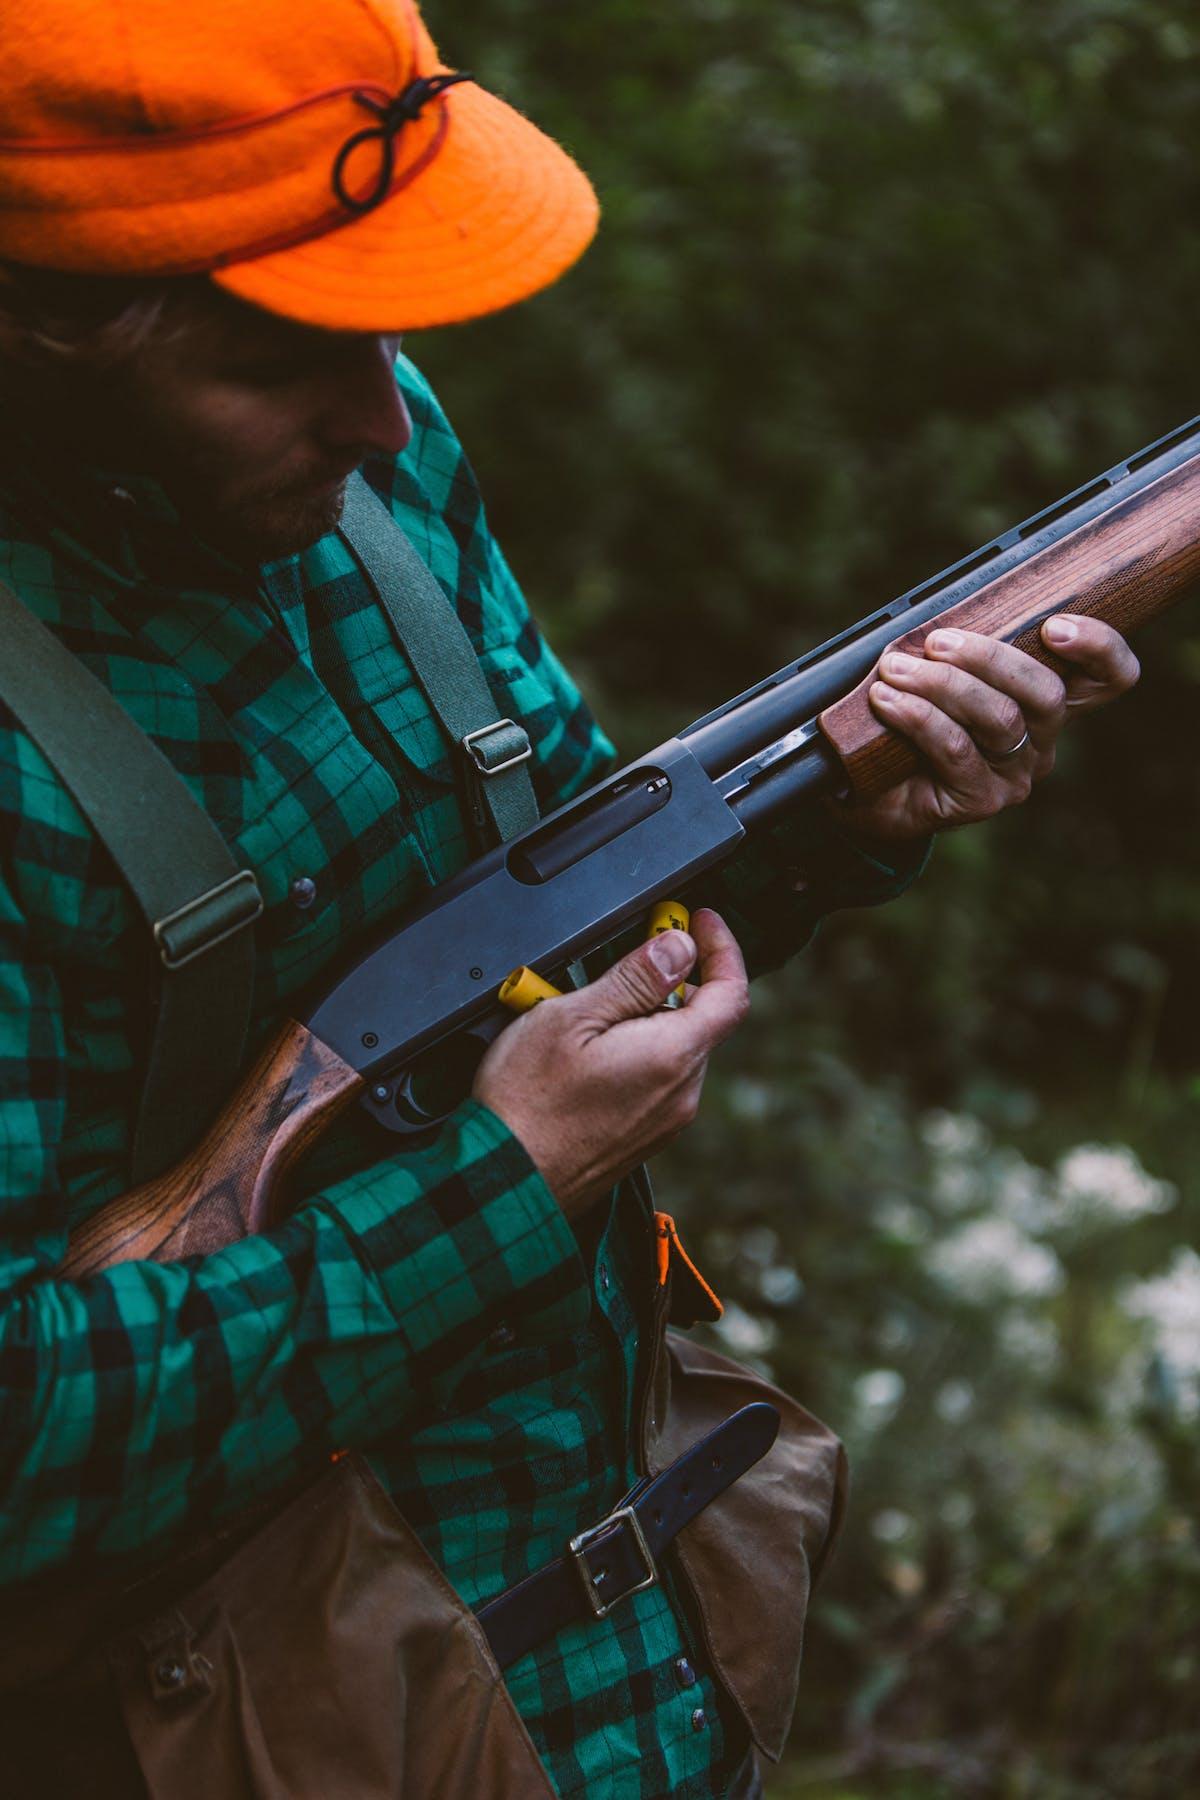 Filson Life - Patrick Loading Shotgun